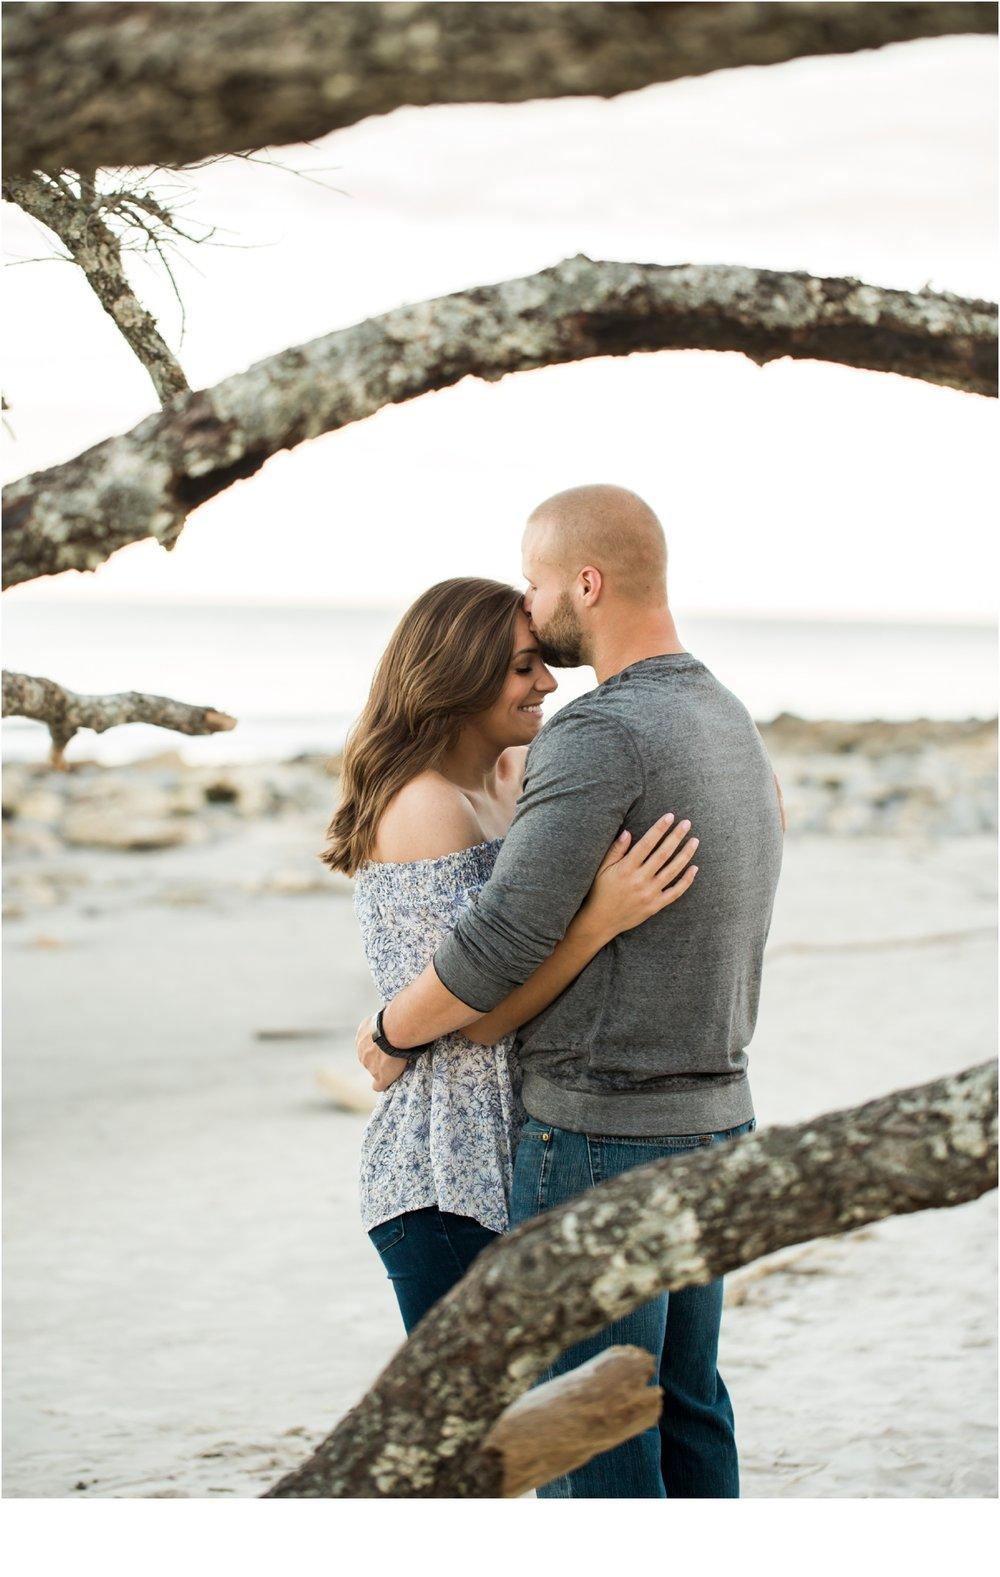 Rainey_Gregg_Photography_St._Simons_Island_Georgia_California_Wedding_Portrait_Photography_0426.jpg